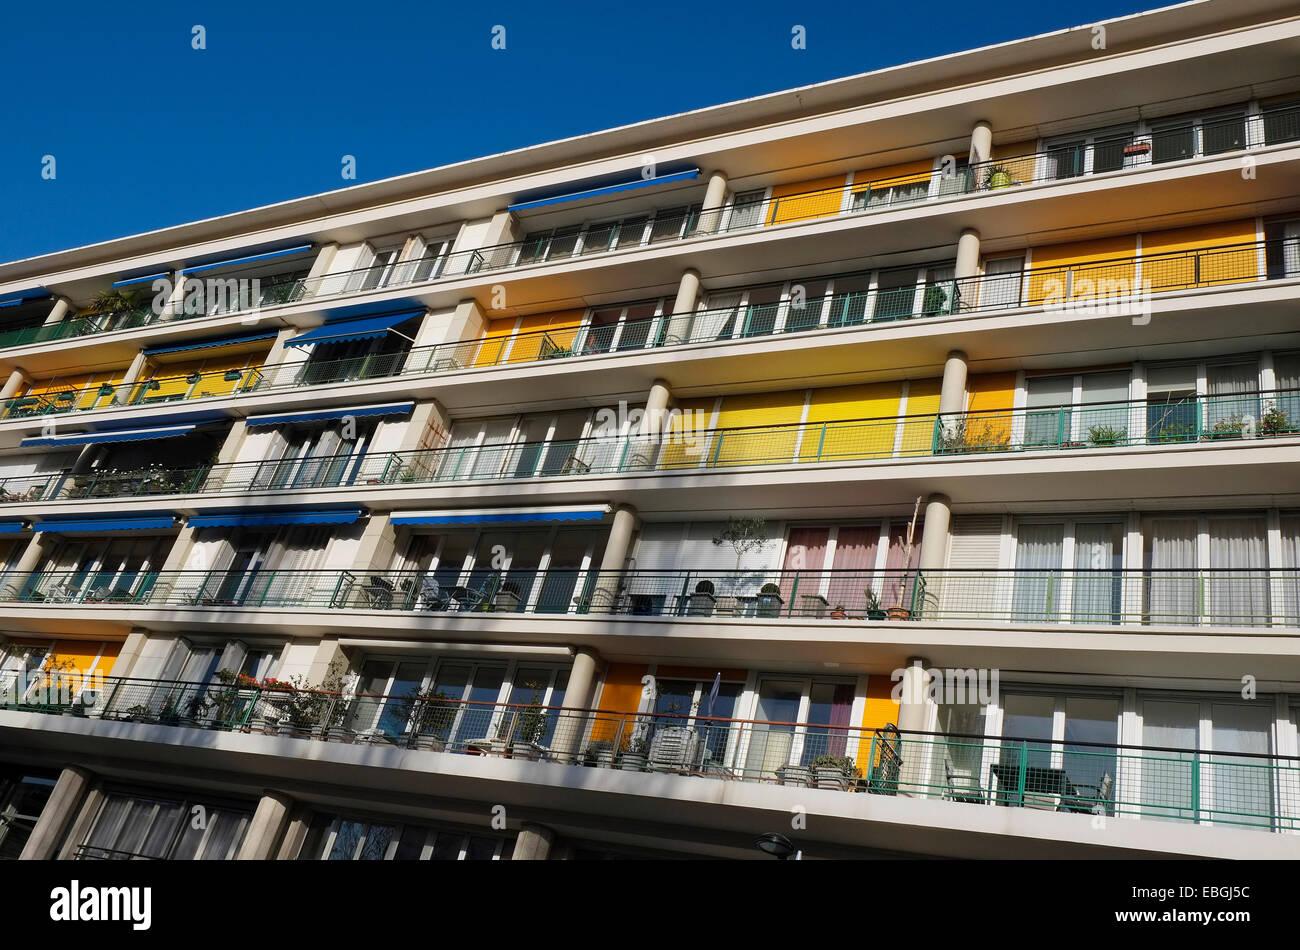 glass balconies apartment block stock photos glass. Black Bedroom Furniture Sets. Home Design Ideas